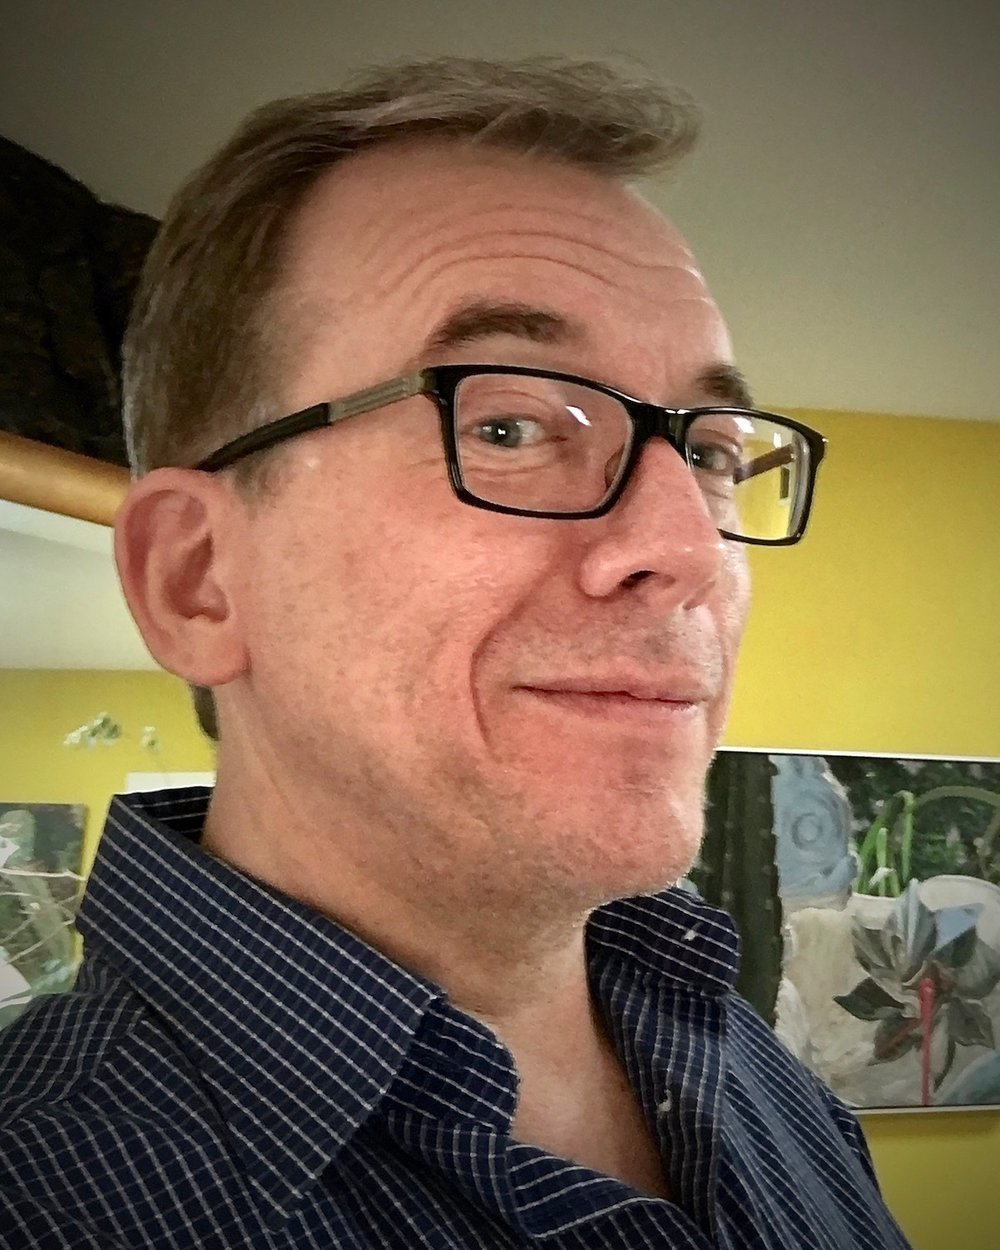 Daniel Prendergast headshot photo by daniel prendergast.jpg